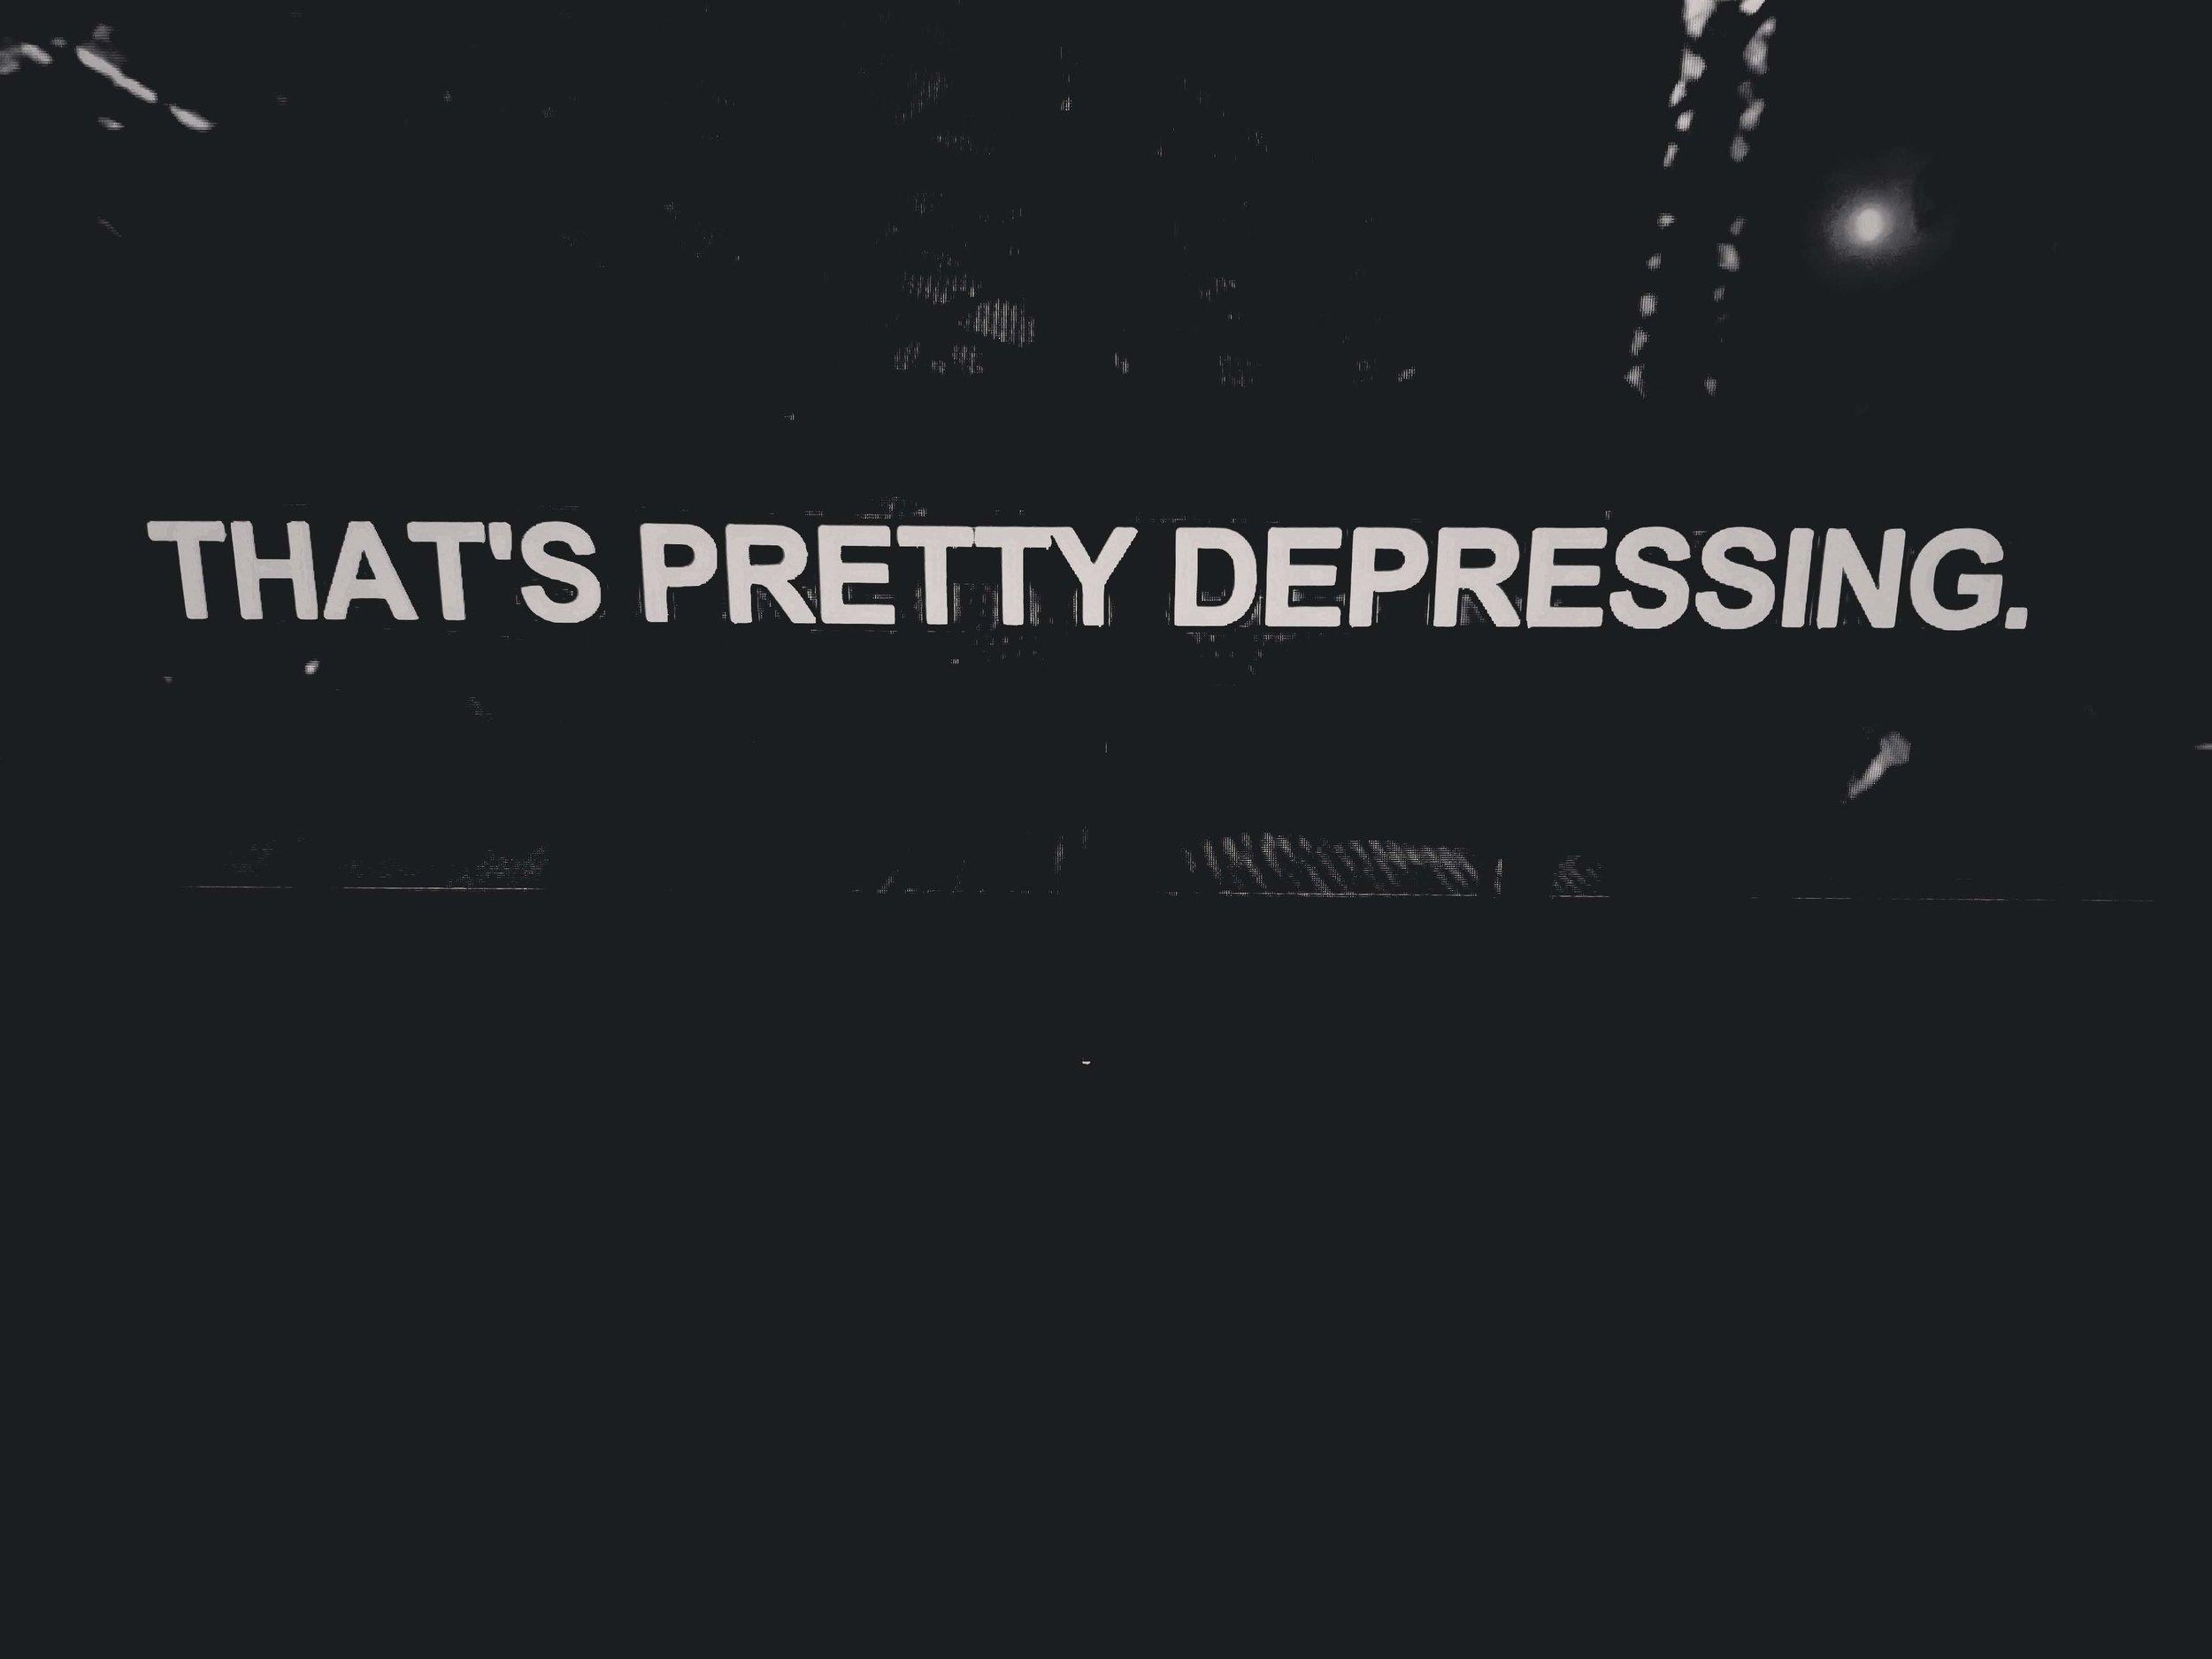 That's Pretty Depressing (2019)